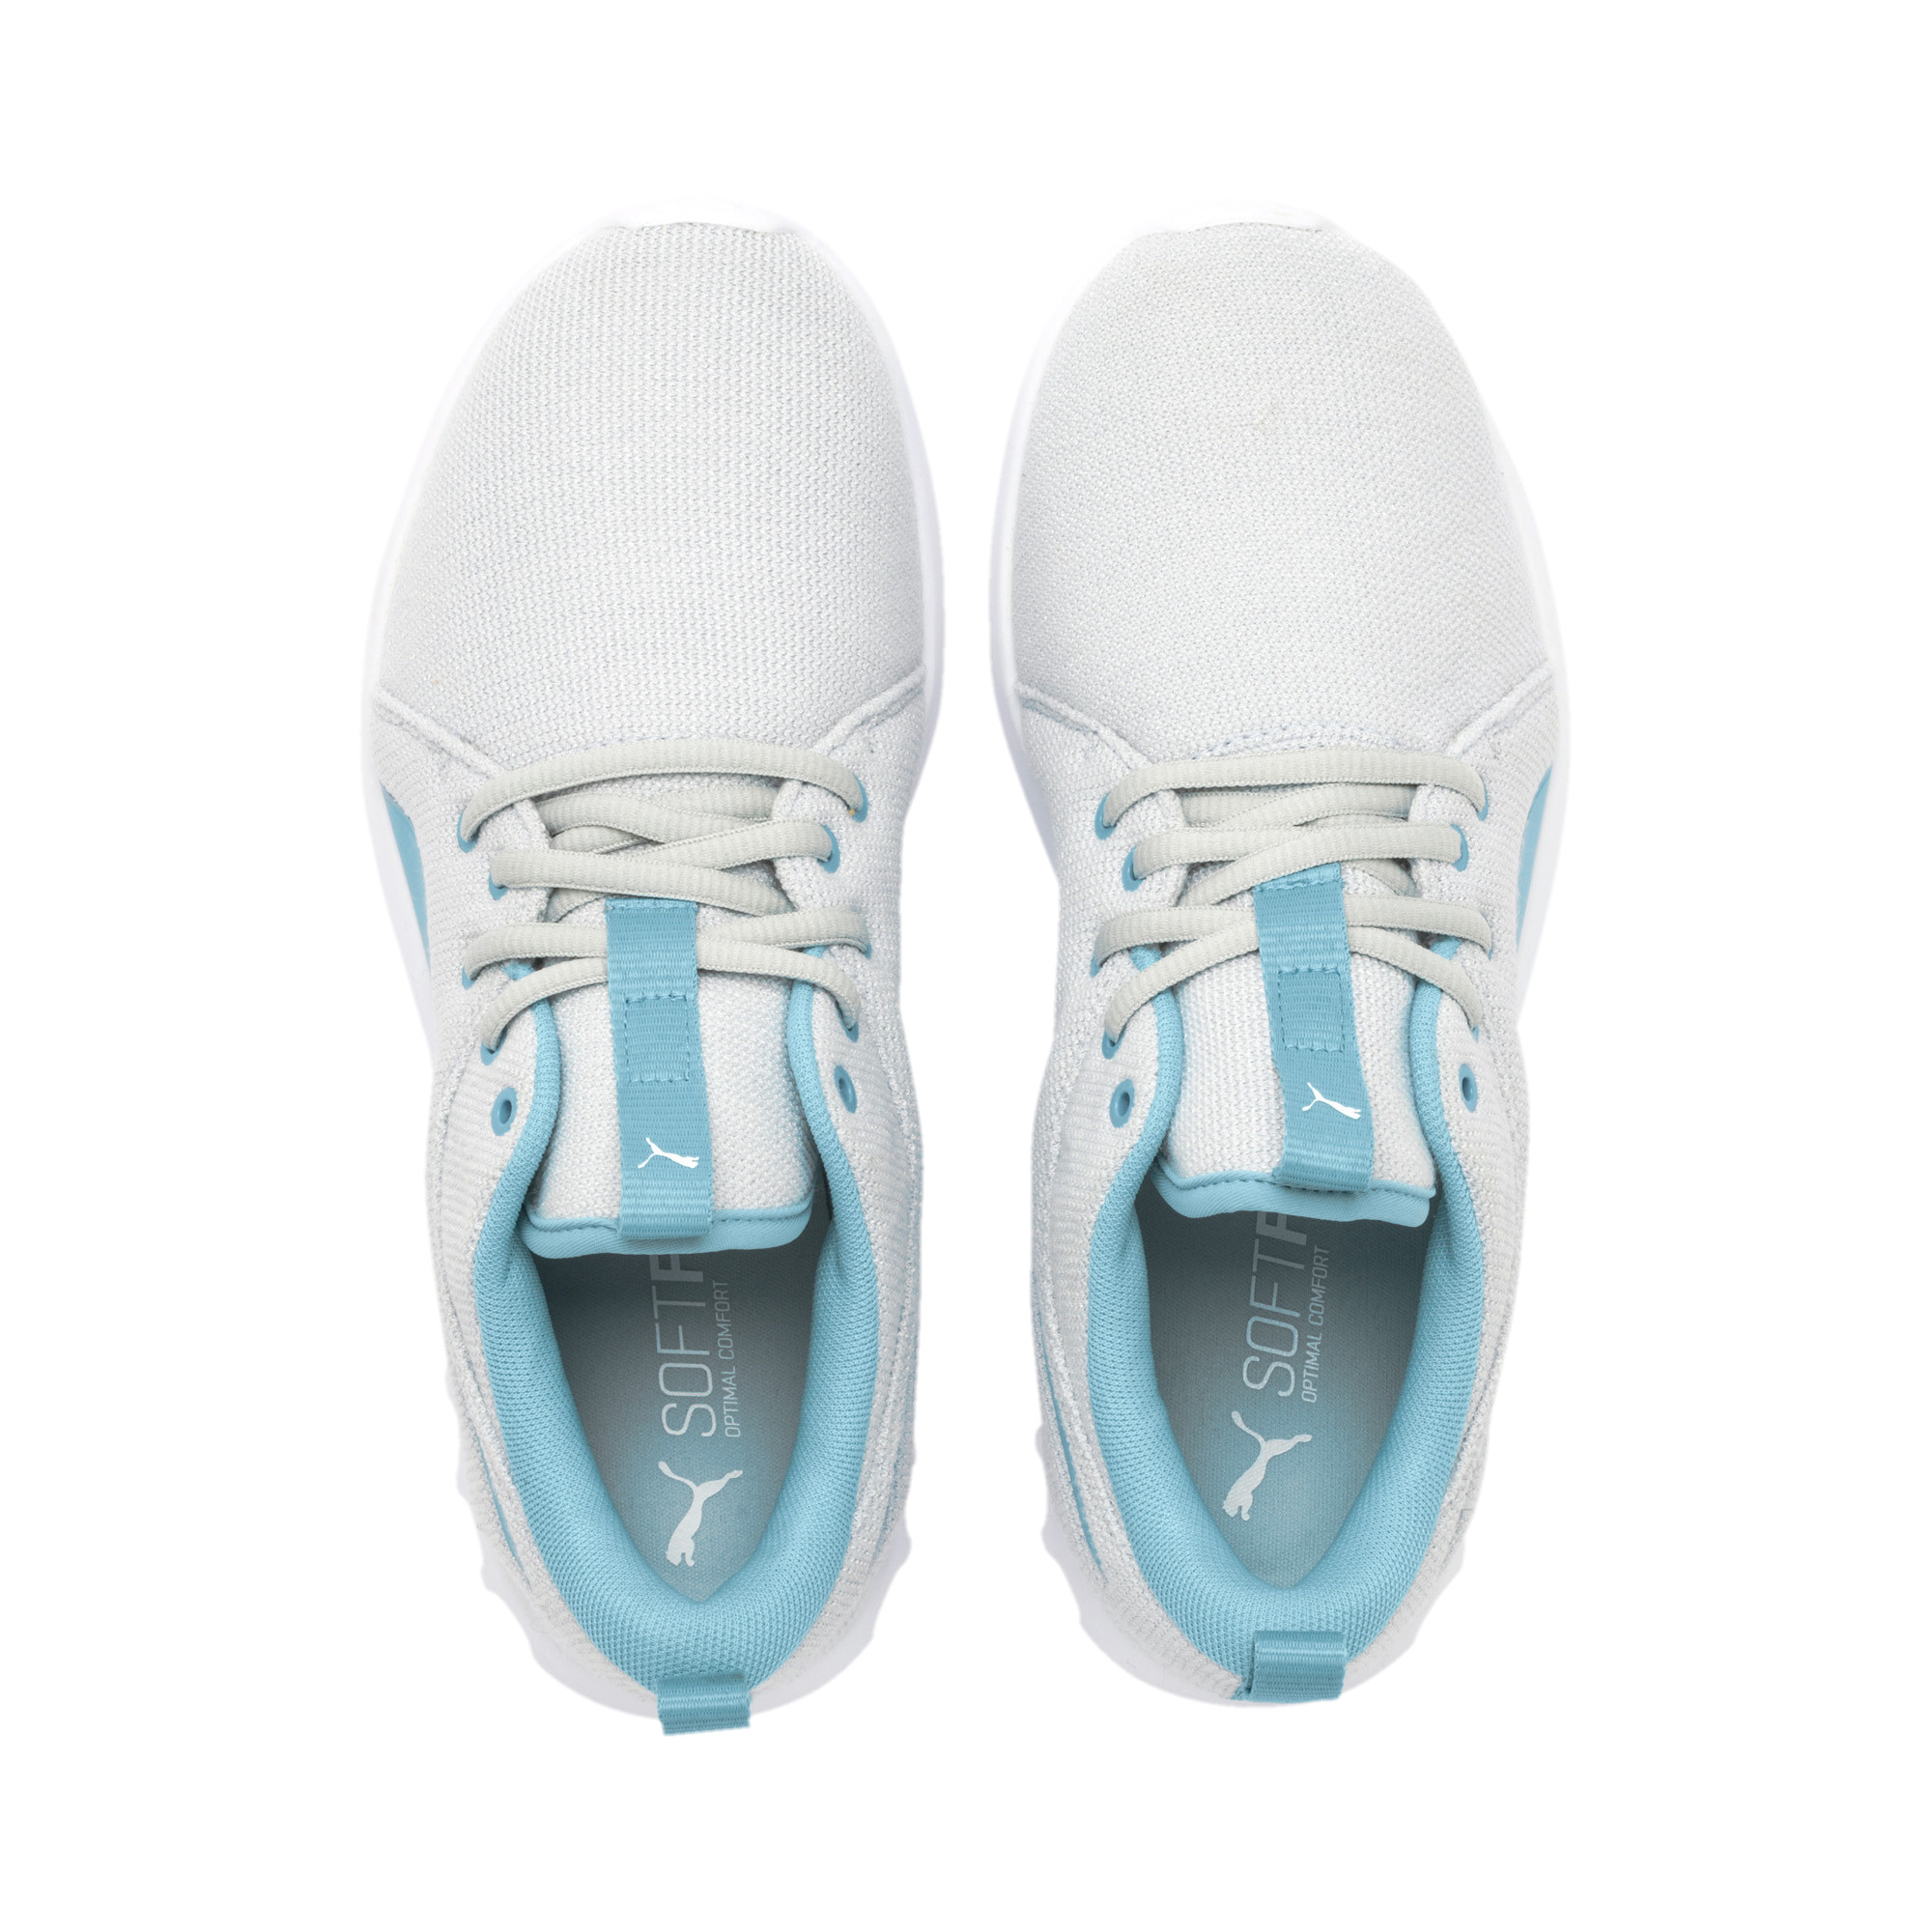 PUMA-Women-039-s-Carson-2-Knit-Running-Shoes thumbnail 39